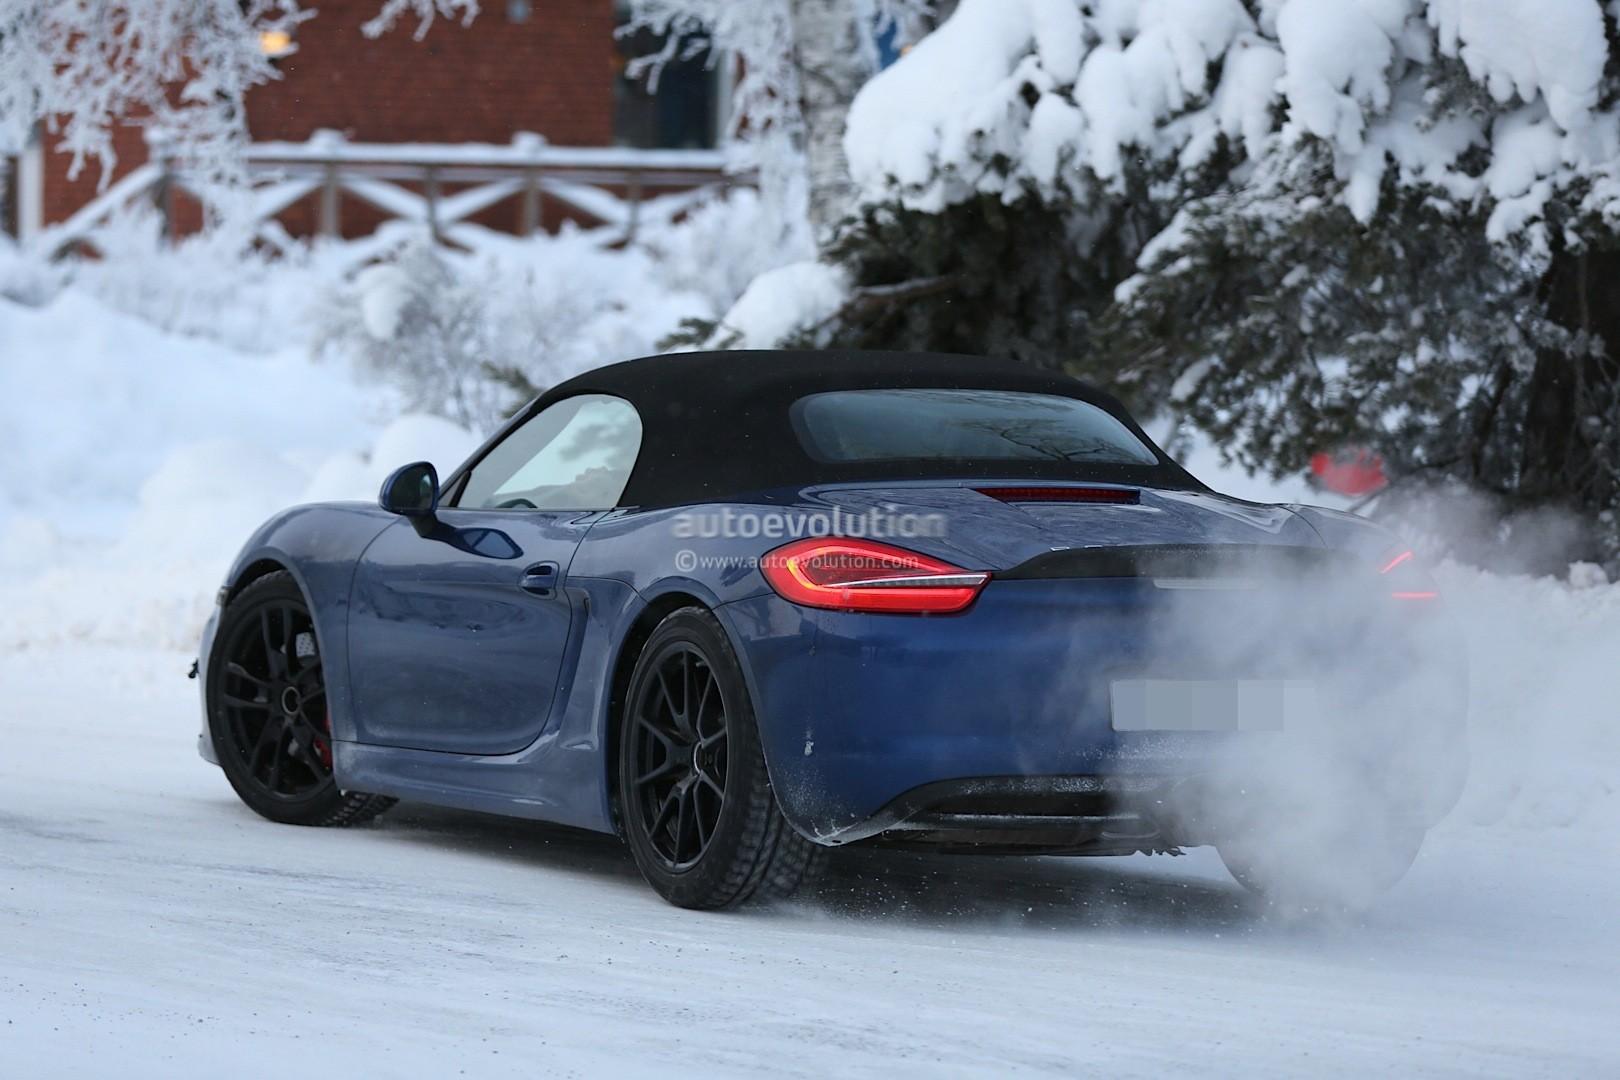 2016 - [Porsche] 718 Boxster & 718 Cayman [982] - Page 2 Spyshots-2016-porsche-boxster-rs-spyder-shows-ducktail-spoiler-aggressive-bumper_6